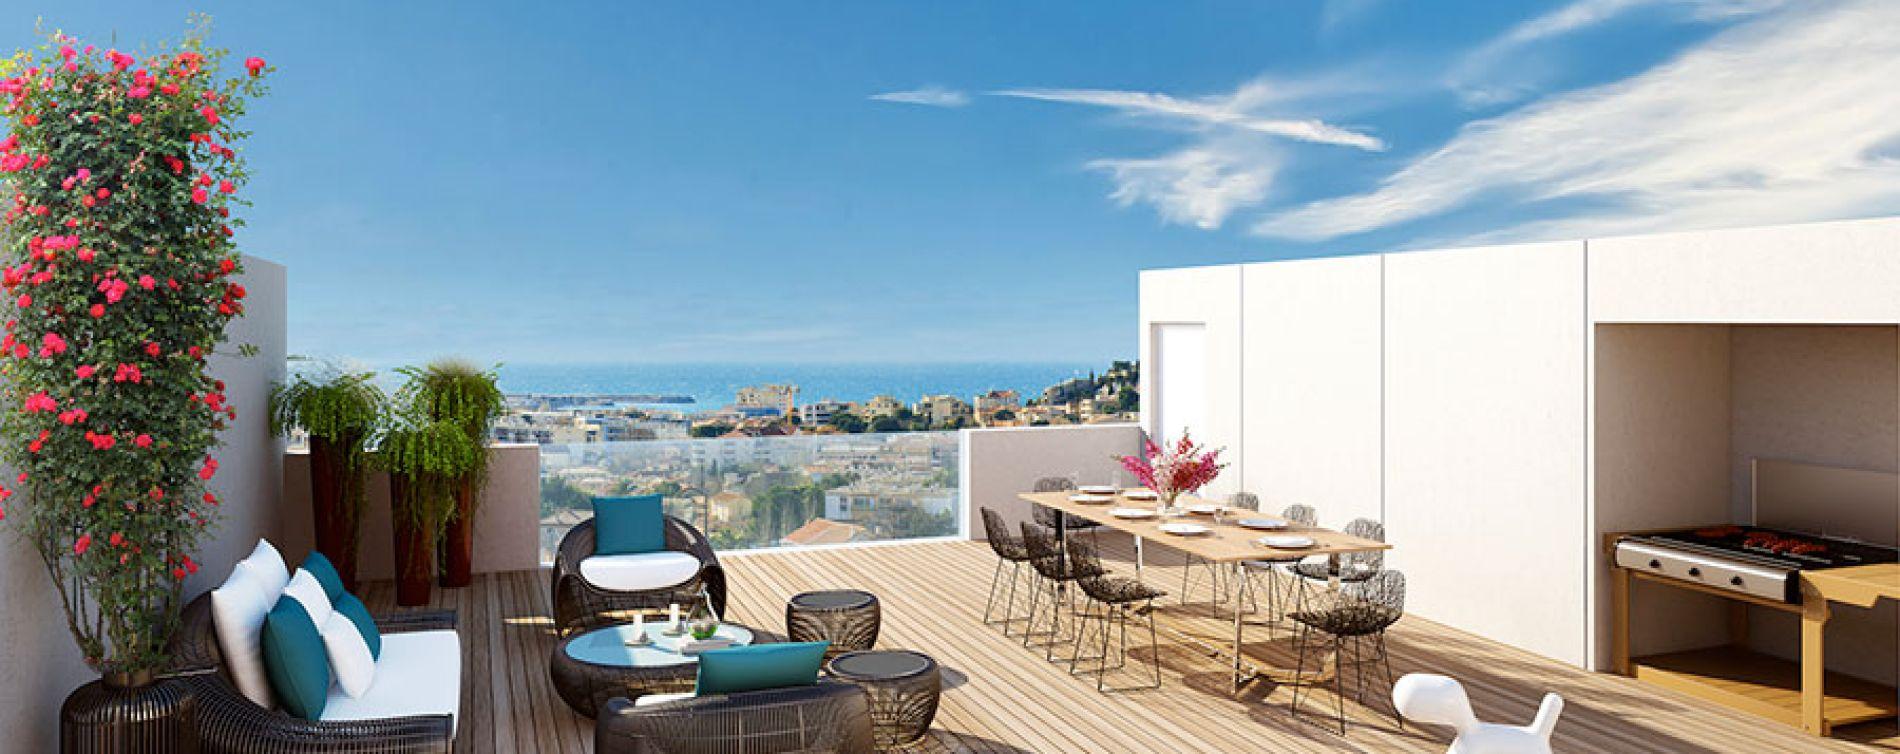 Résidence Le Bao à Marseille